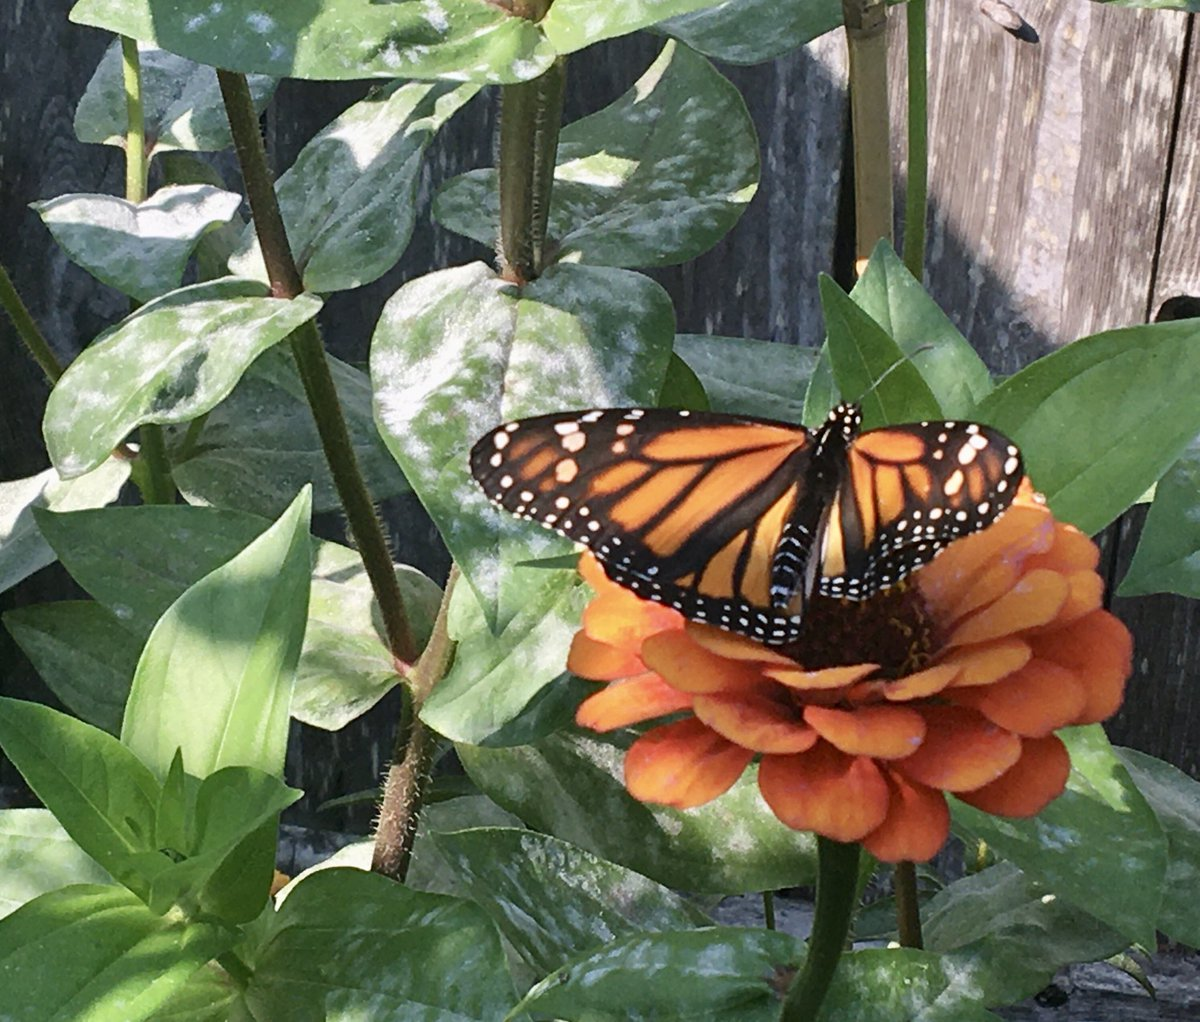 Released 12 #monarchbutterflies this morning https://t.co/E2x1S4Kxor